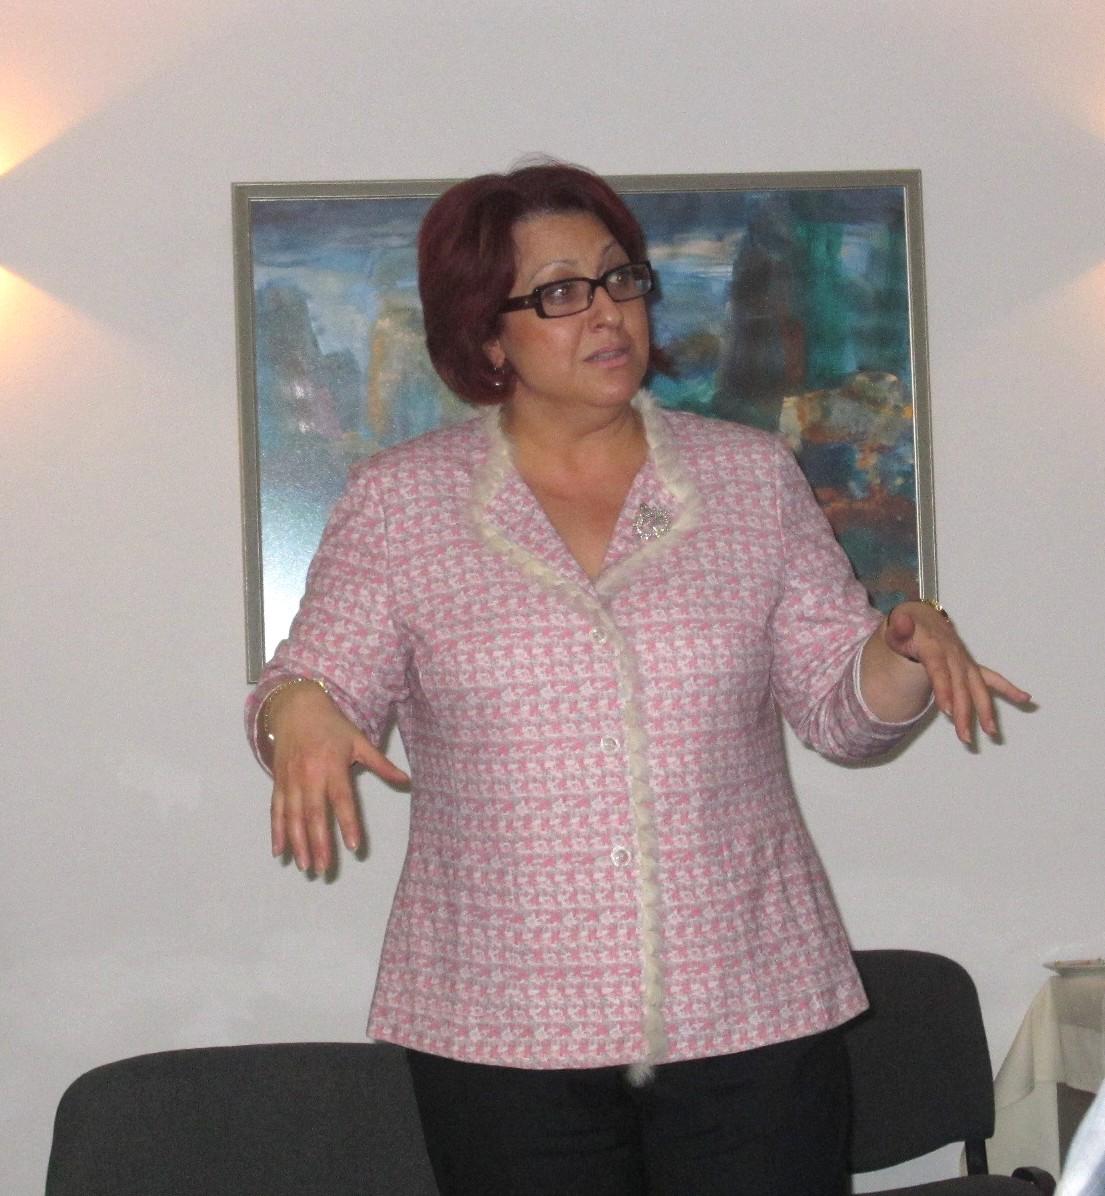 Mrs Arakelyan at the Café Sosiete meeting